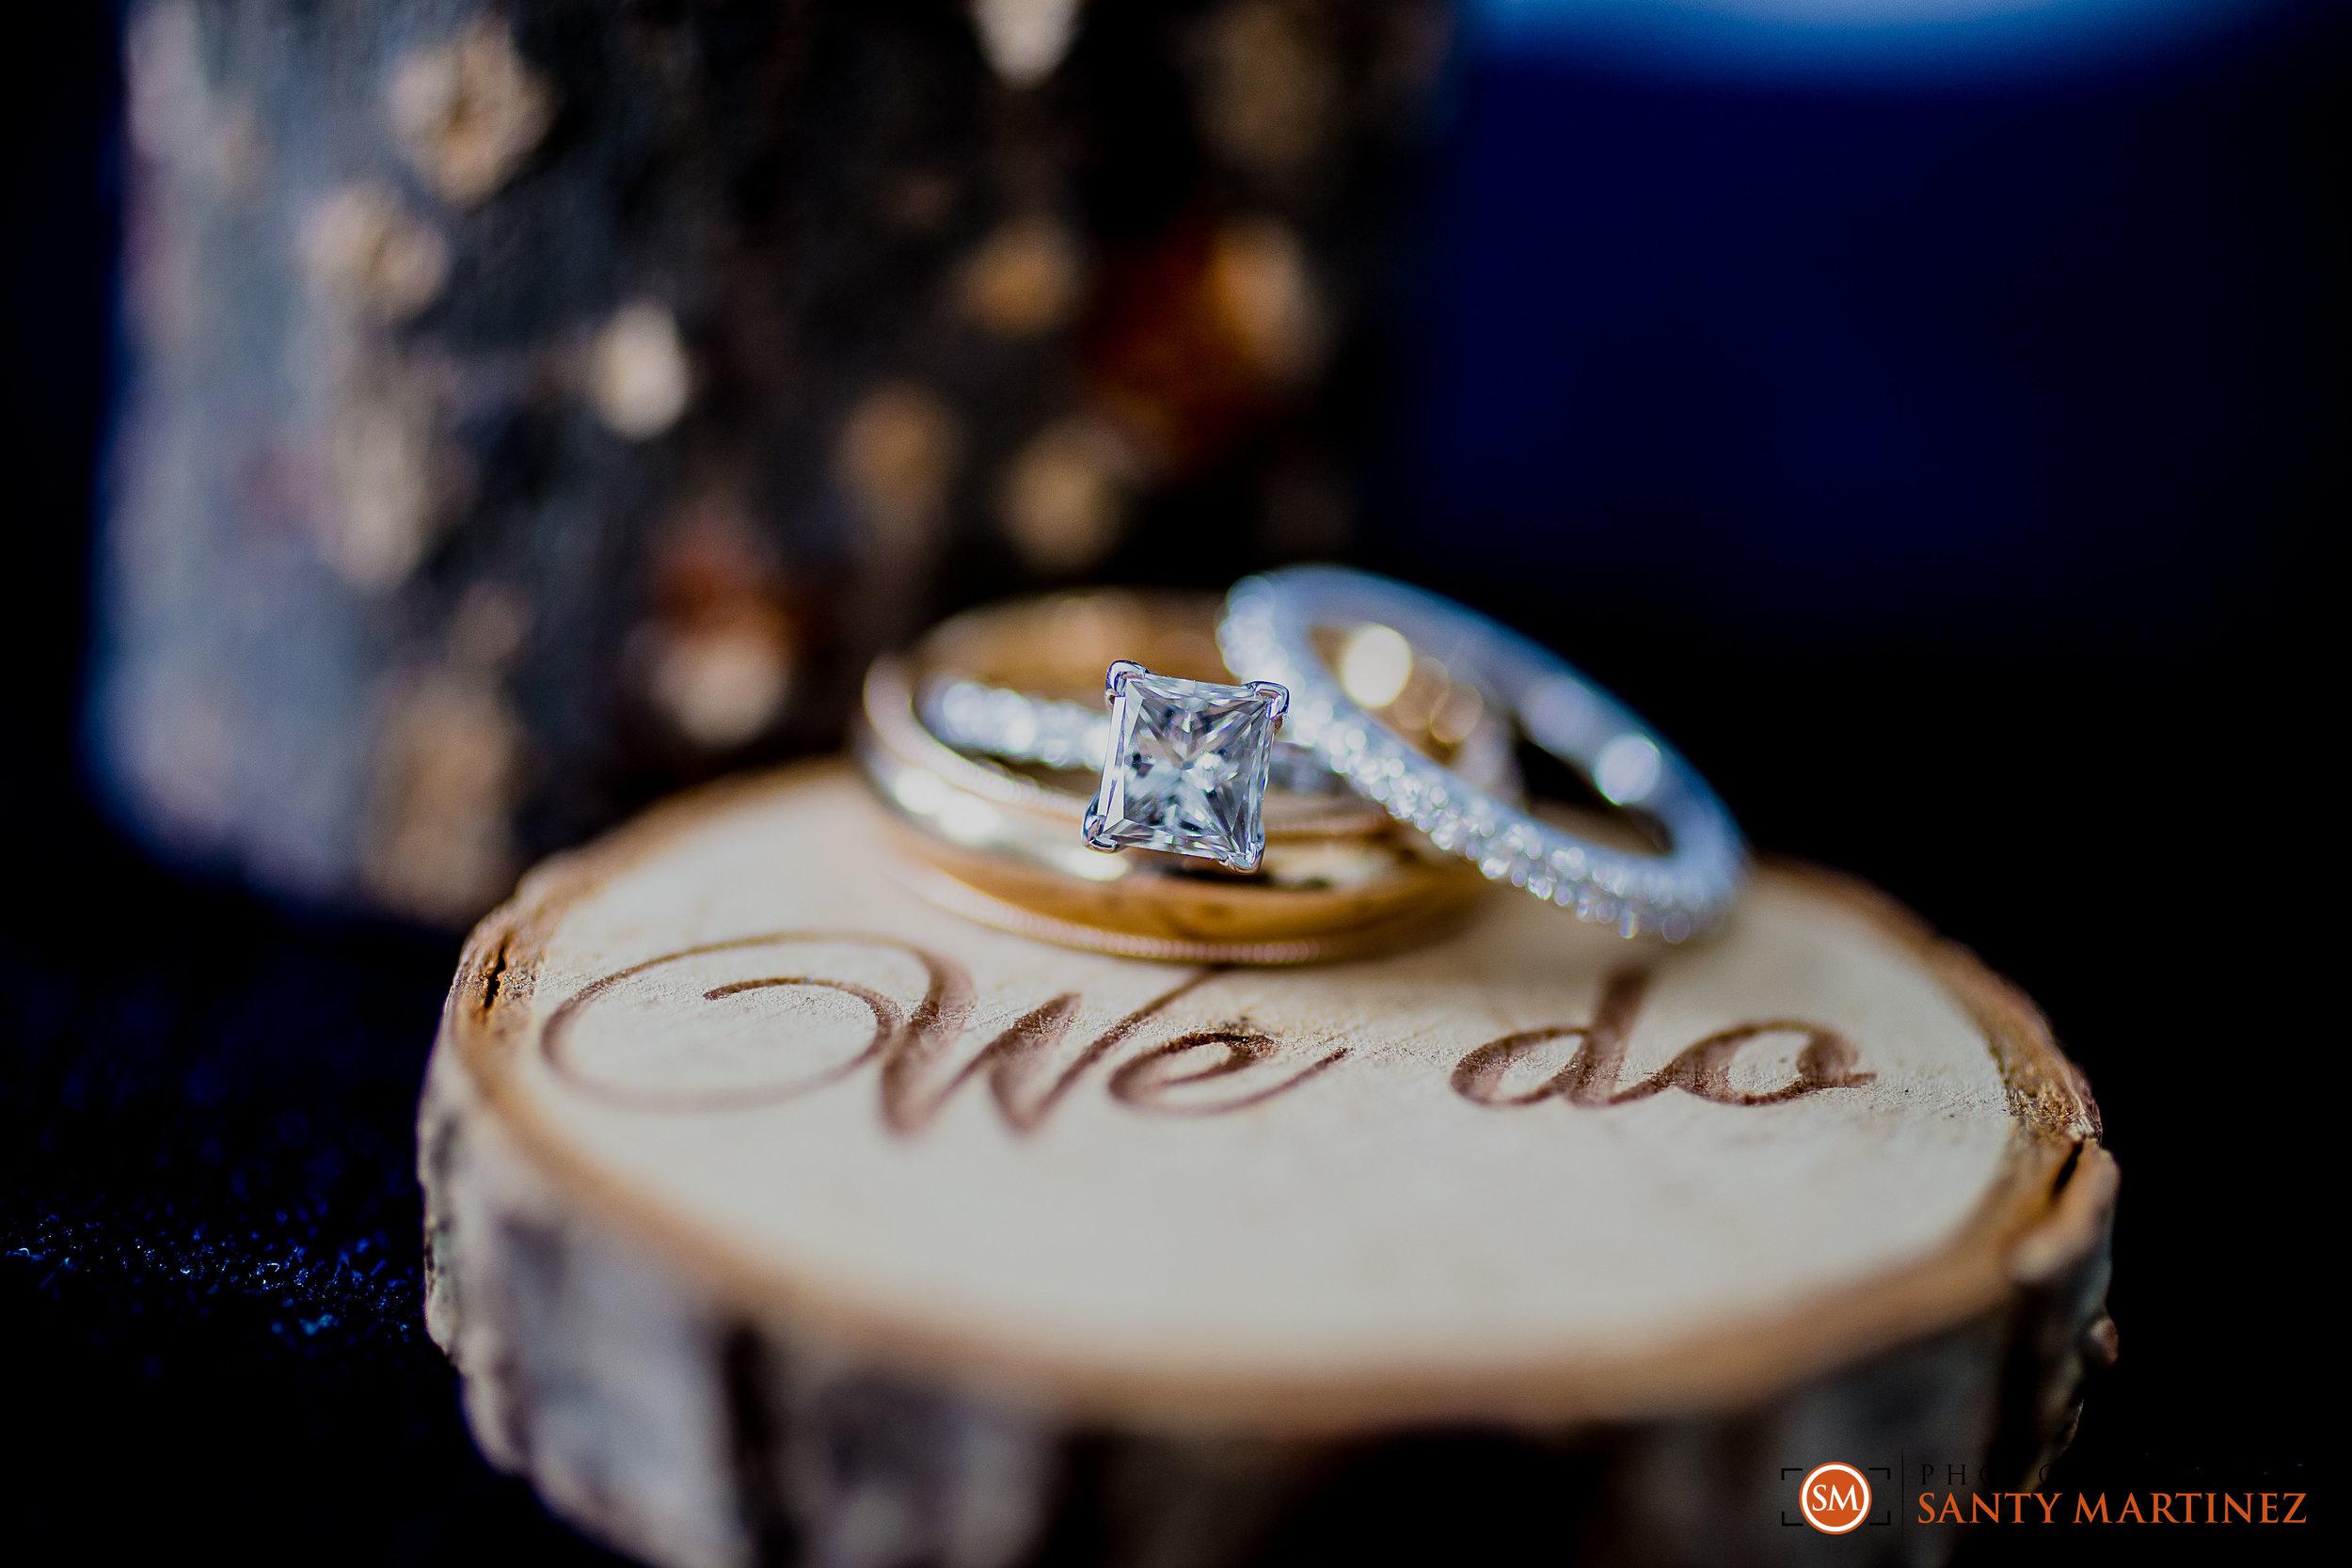 Wedding La Jolla Ballroom - Photography by Santy Martinez-2.jpg